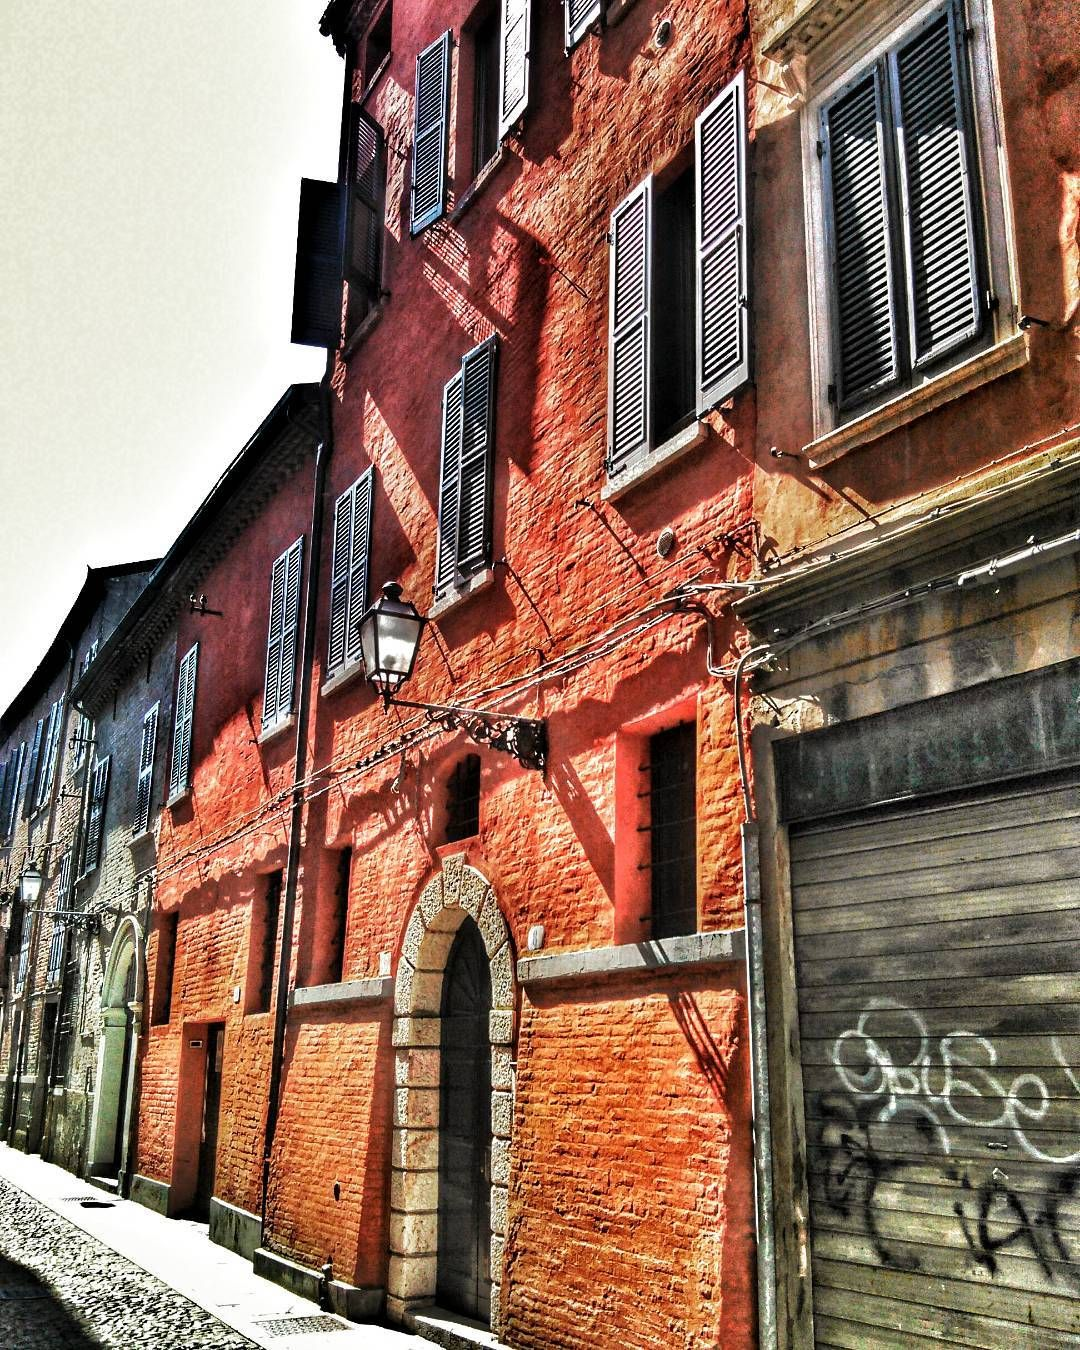 Ferrara via Cavedone #sole #luce#cittamedioevale#igersferrara #Ig_ferrara #vivoferrara #comunediferrara #turismoer #myferrara #vivodiparticolari #going_into_details #italian_photo_lovers #lovesmadeinitaly #volgoitalia #borghitalia #instagramers #volgoferrara #ptk_italy #kings_vilages #clikitaly by mariolinabeltrami